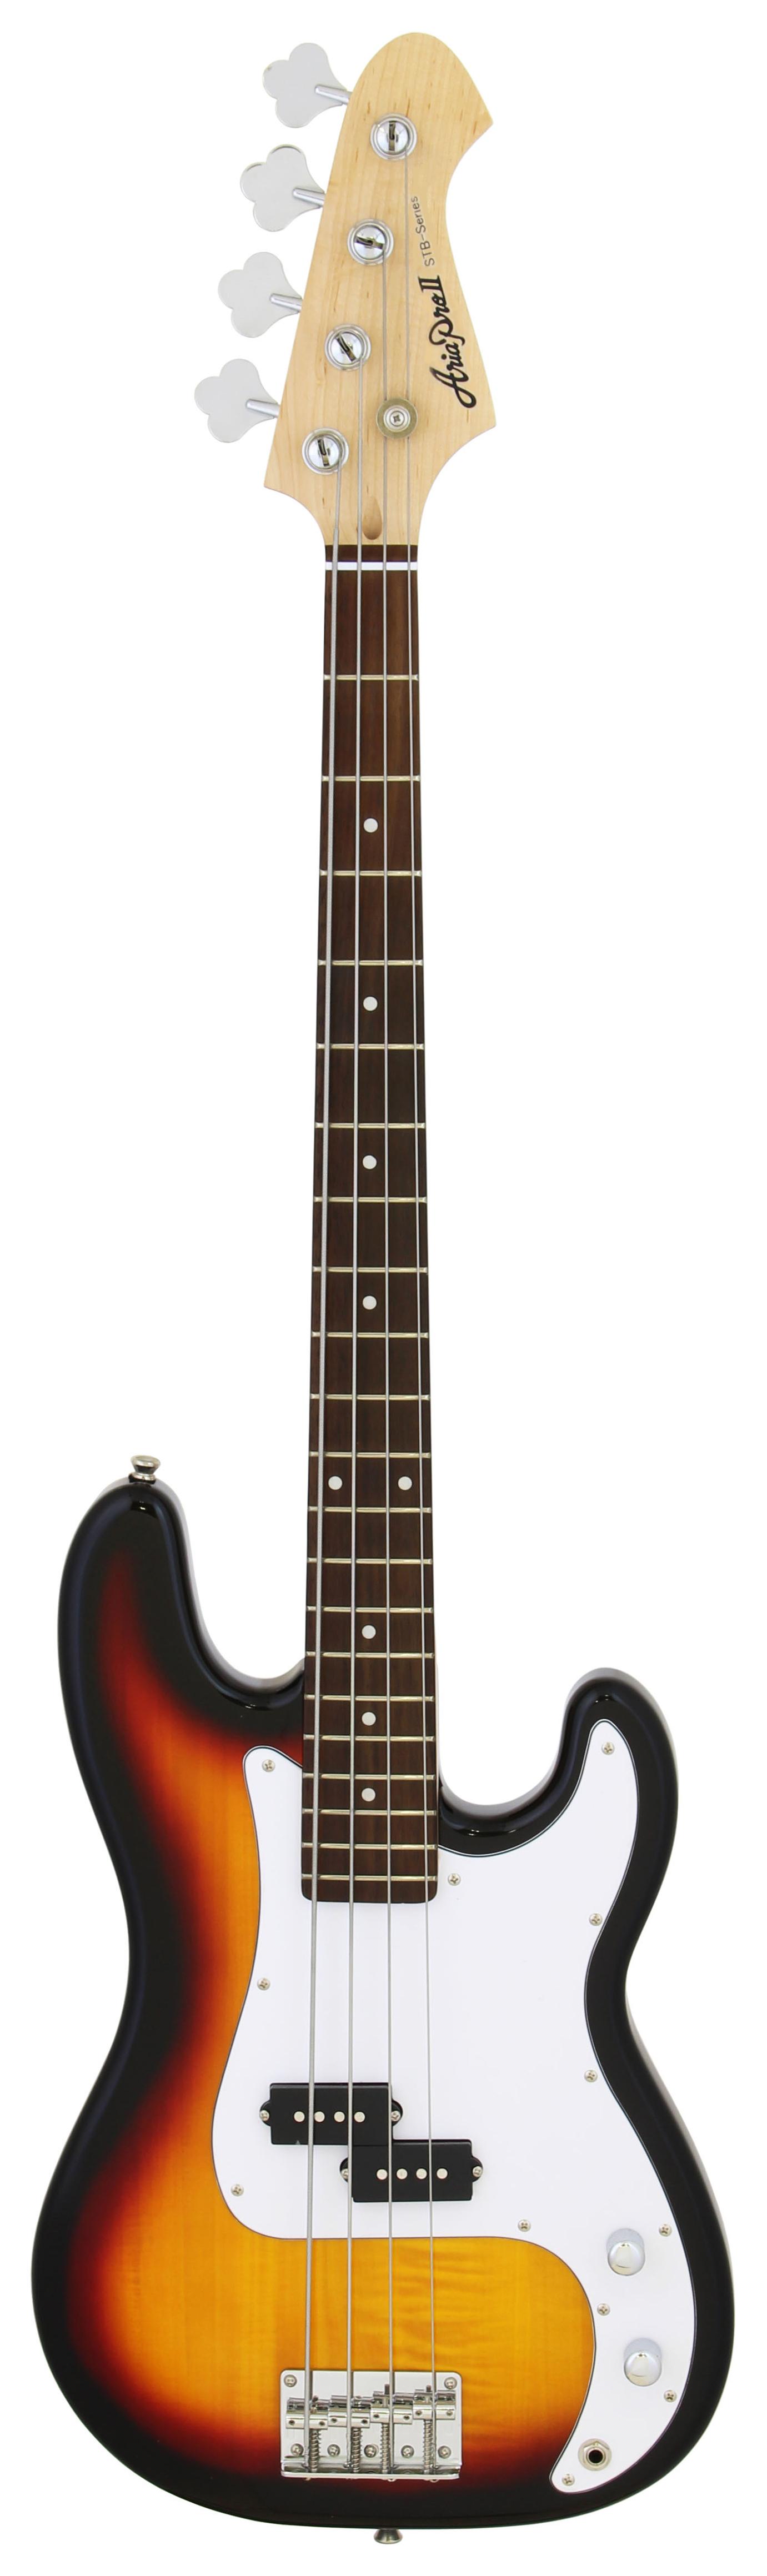 Aria Pro II STB-PB bass guitar